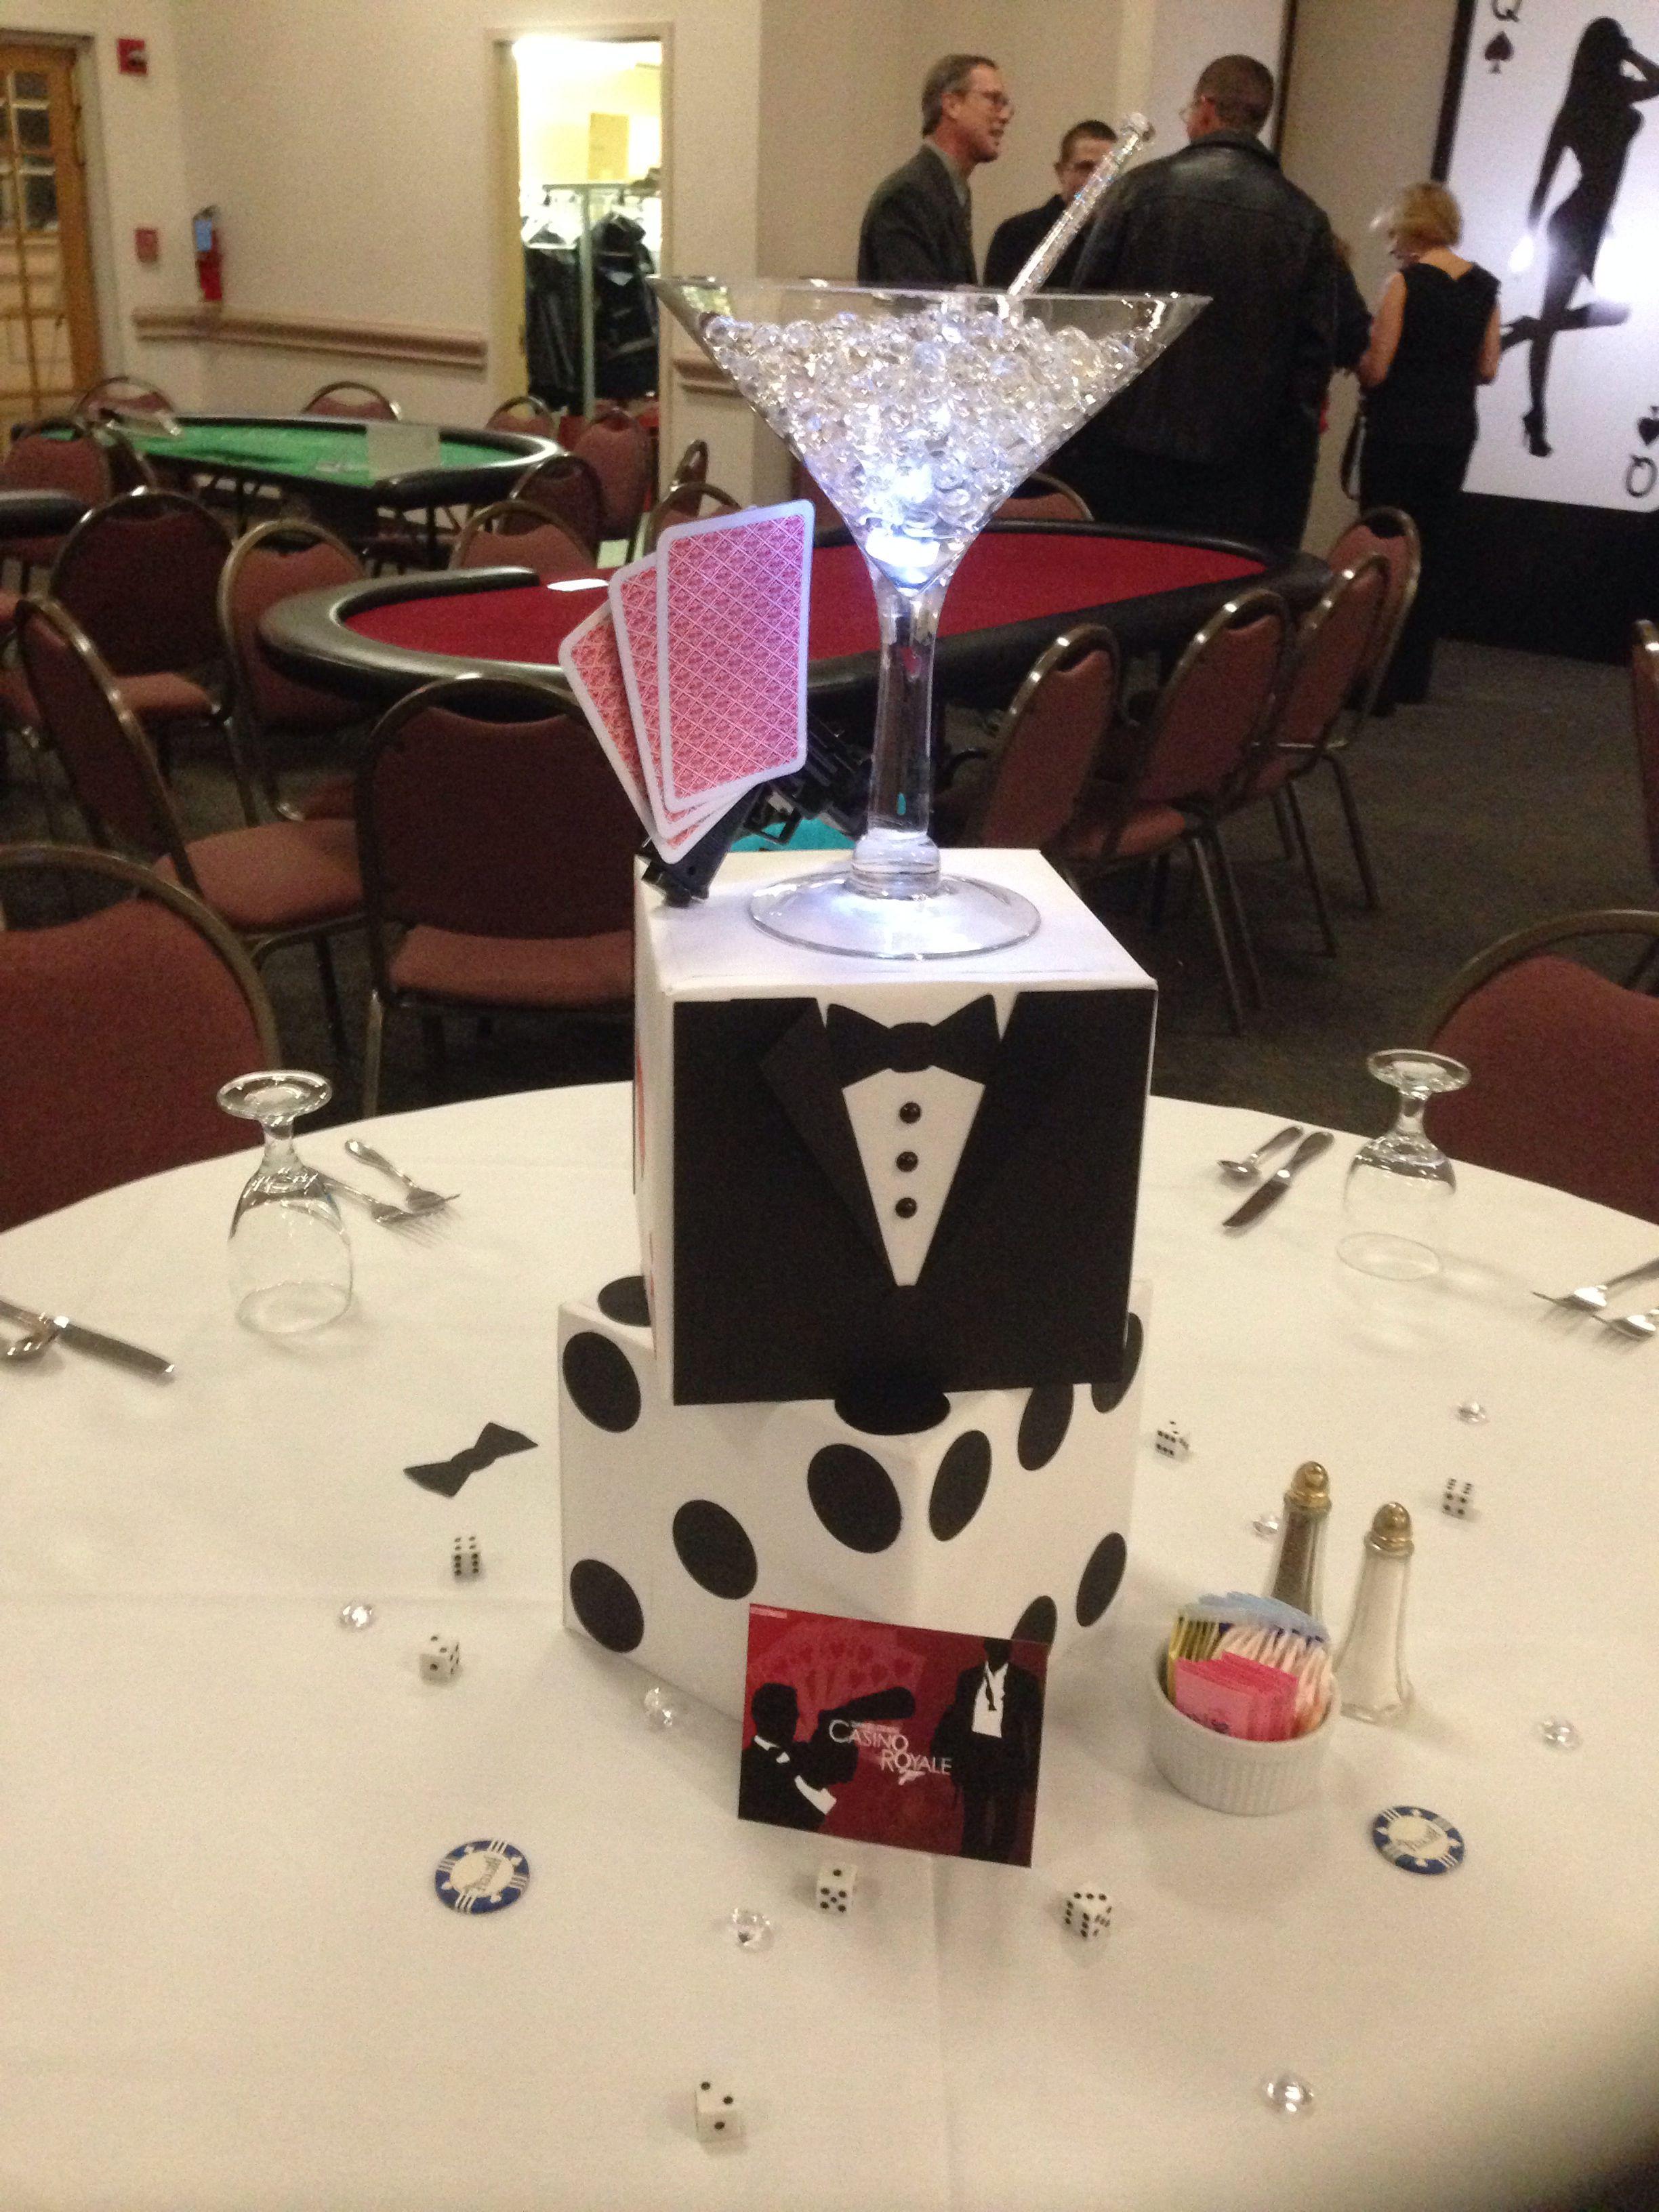 james bond casino royale event centerpieces wedding. Black Bedroom Furniture Sets. Home Design Ideas